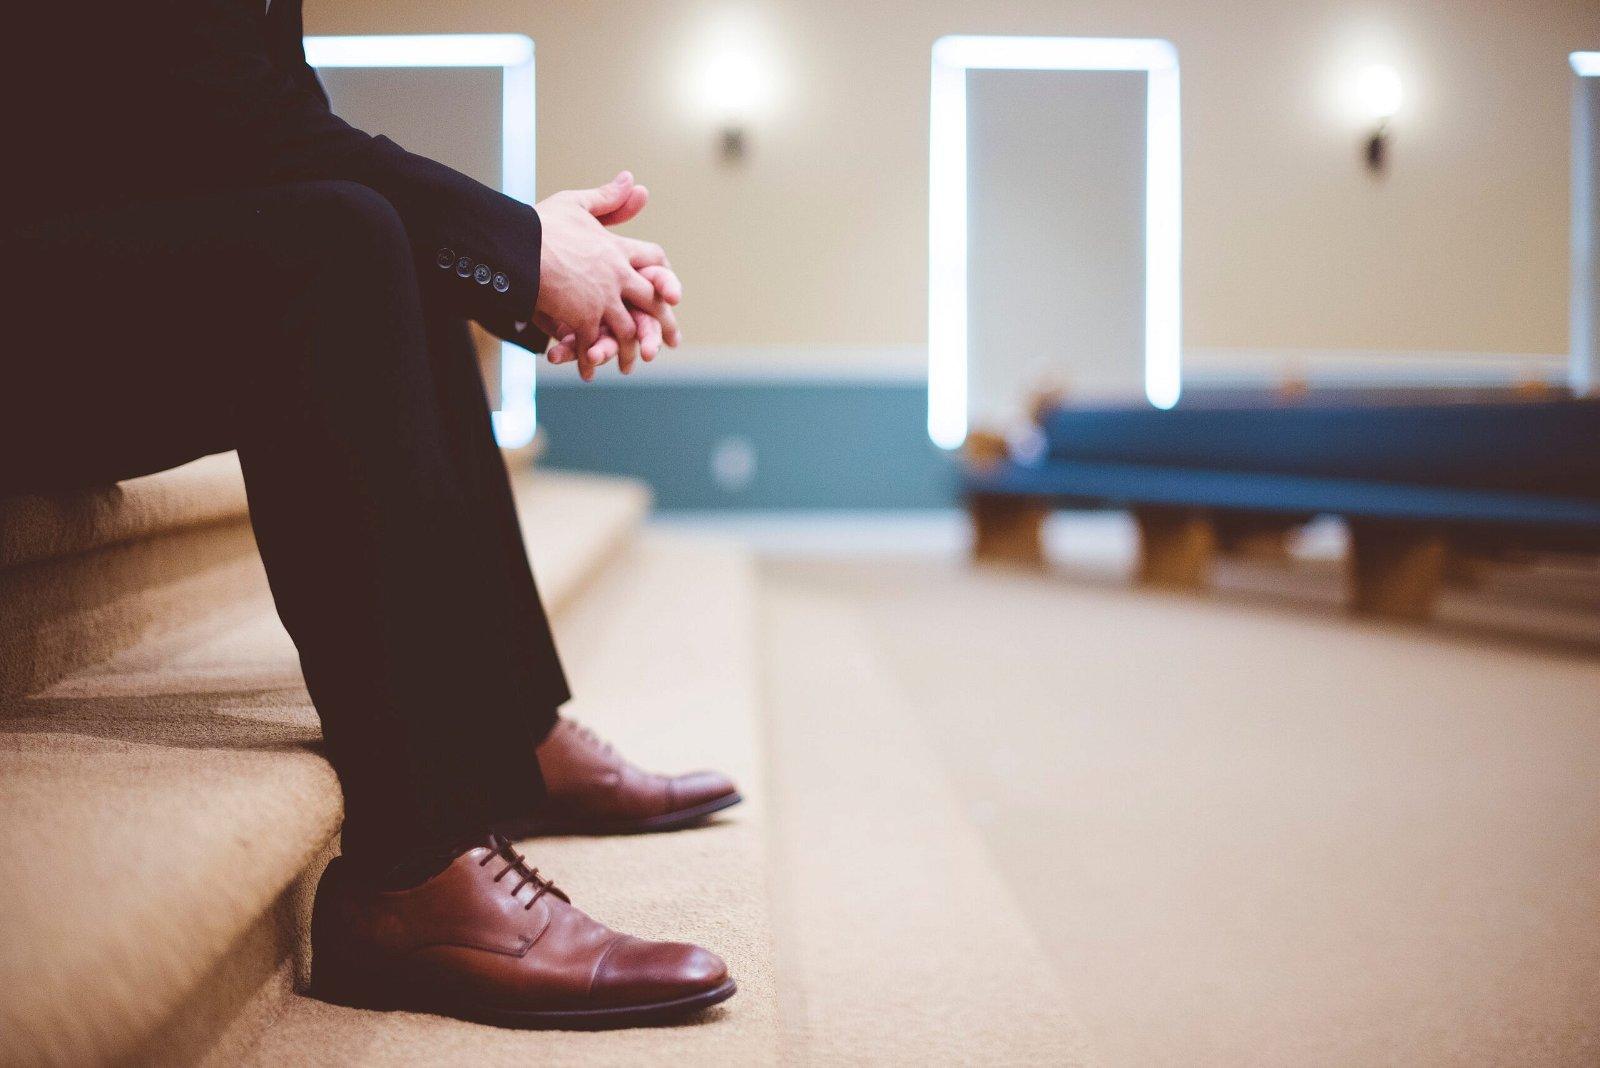 Musings Of A Preaching Biblical Counselor